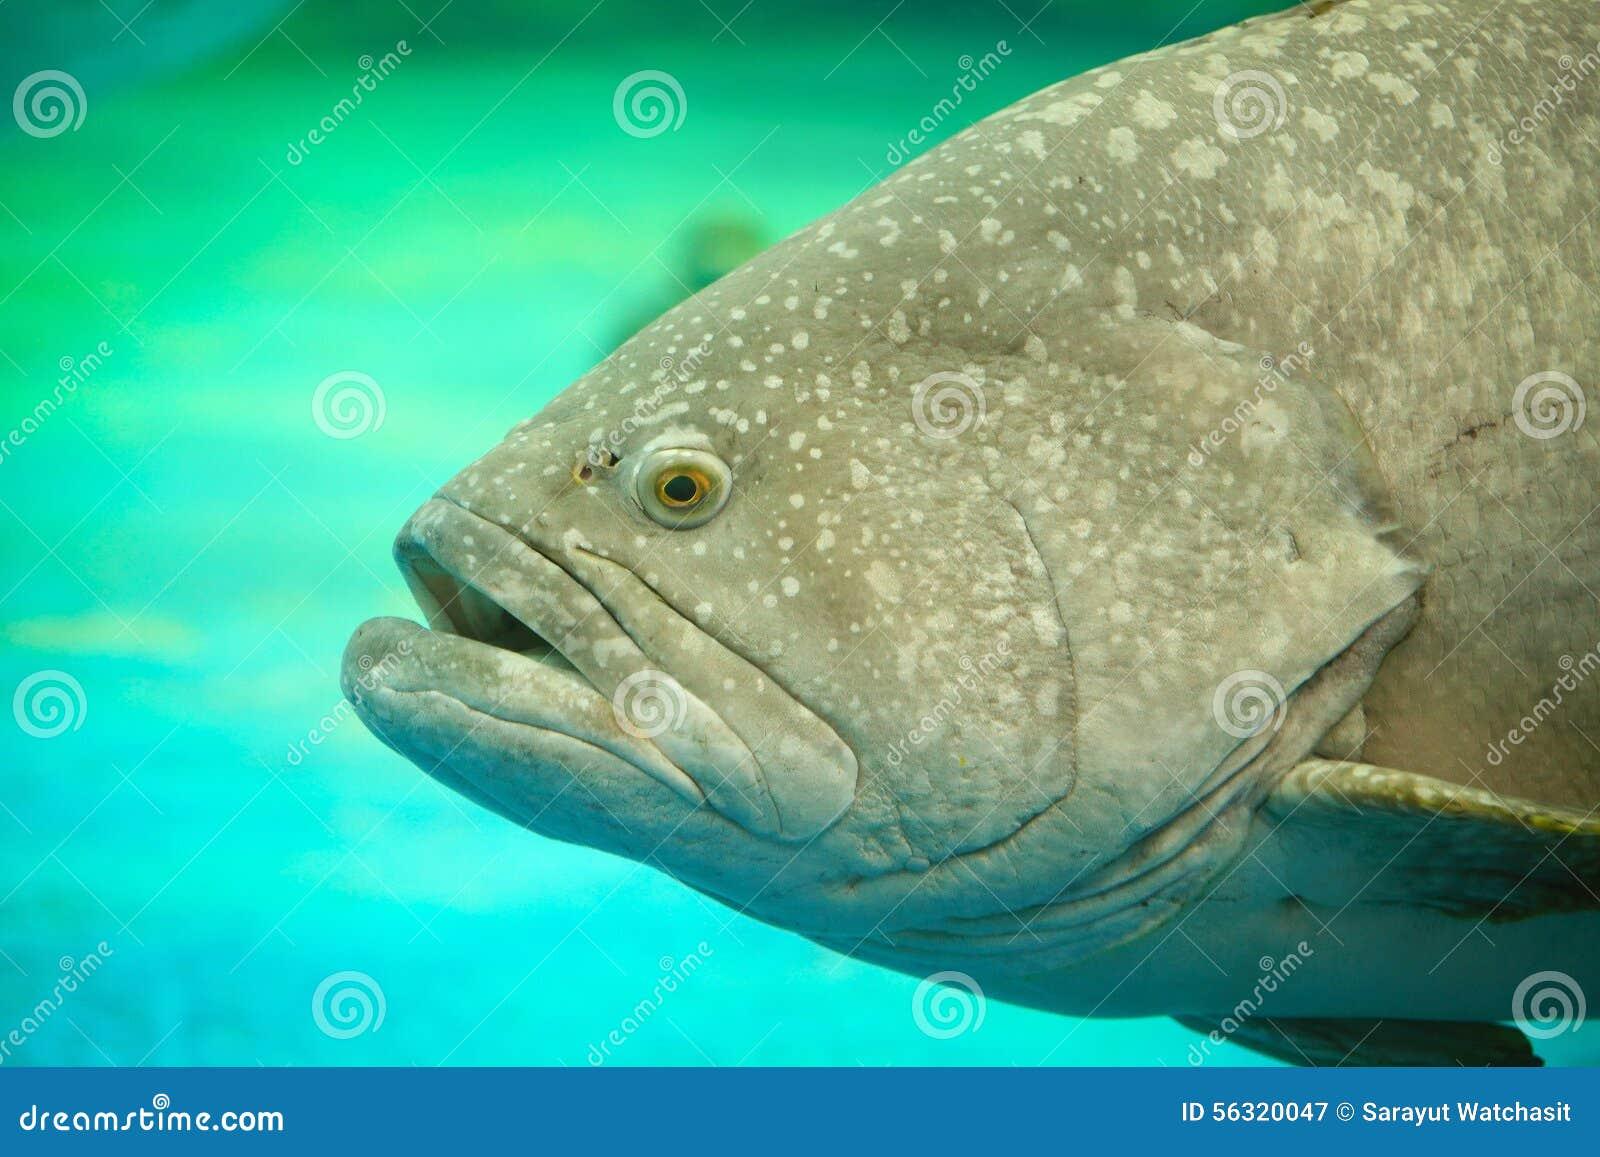 Atlantic Goliath Grouper Stock Image Image Of Artificial 56320047